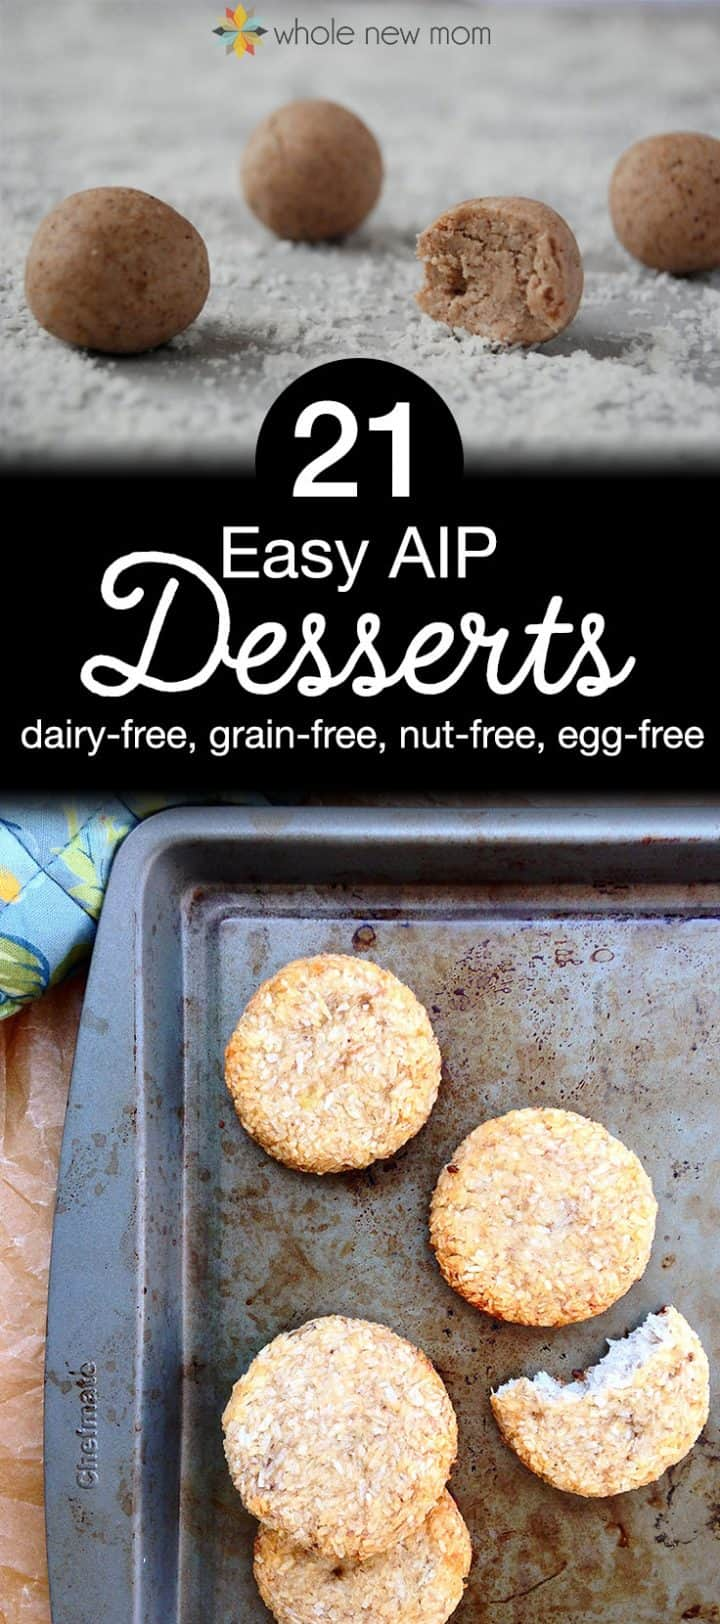 Easy AIP Desserts